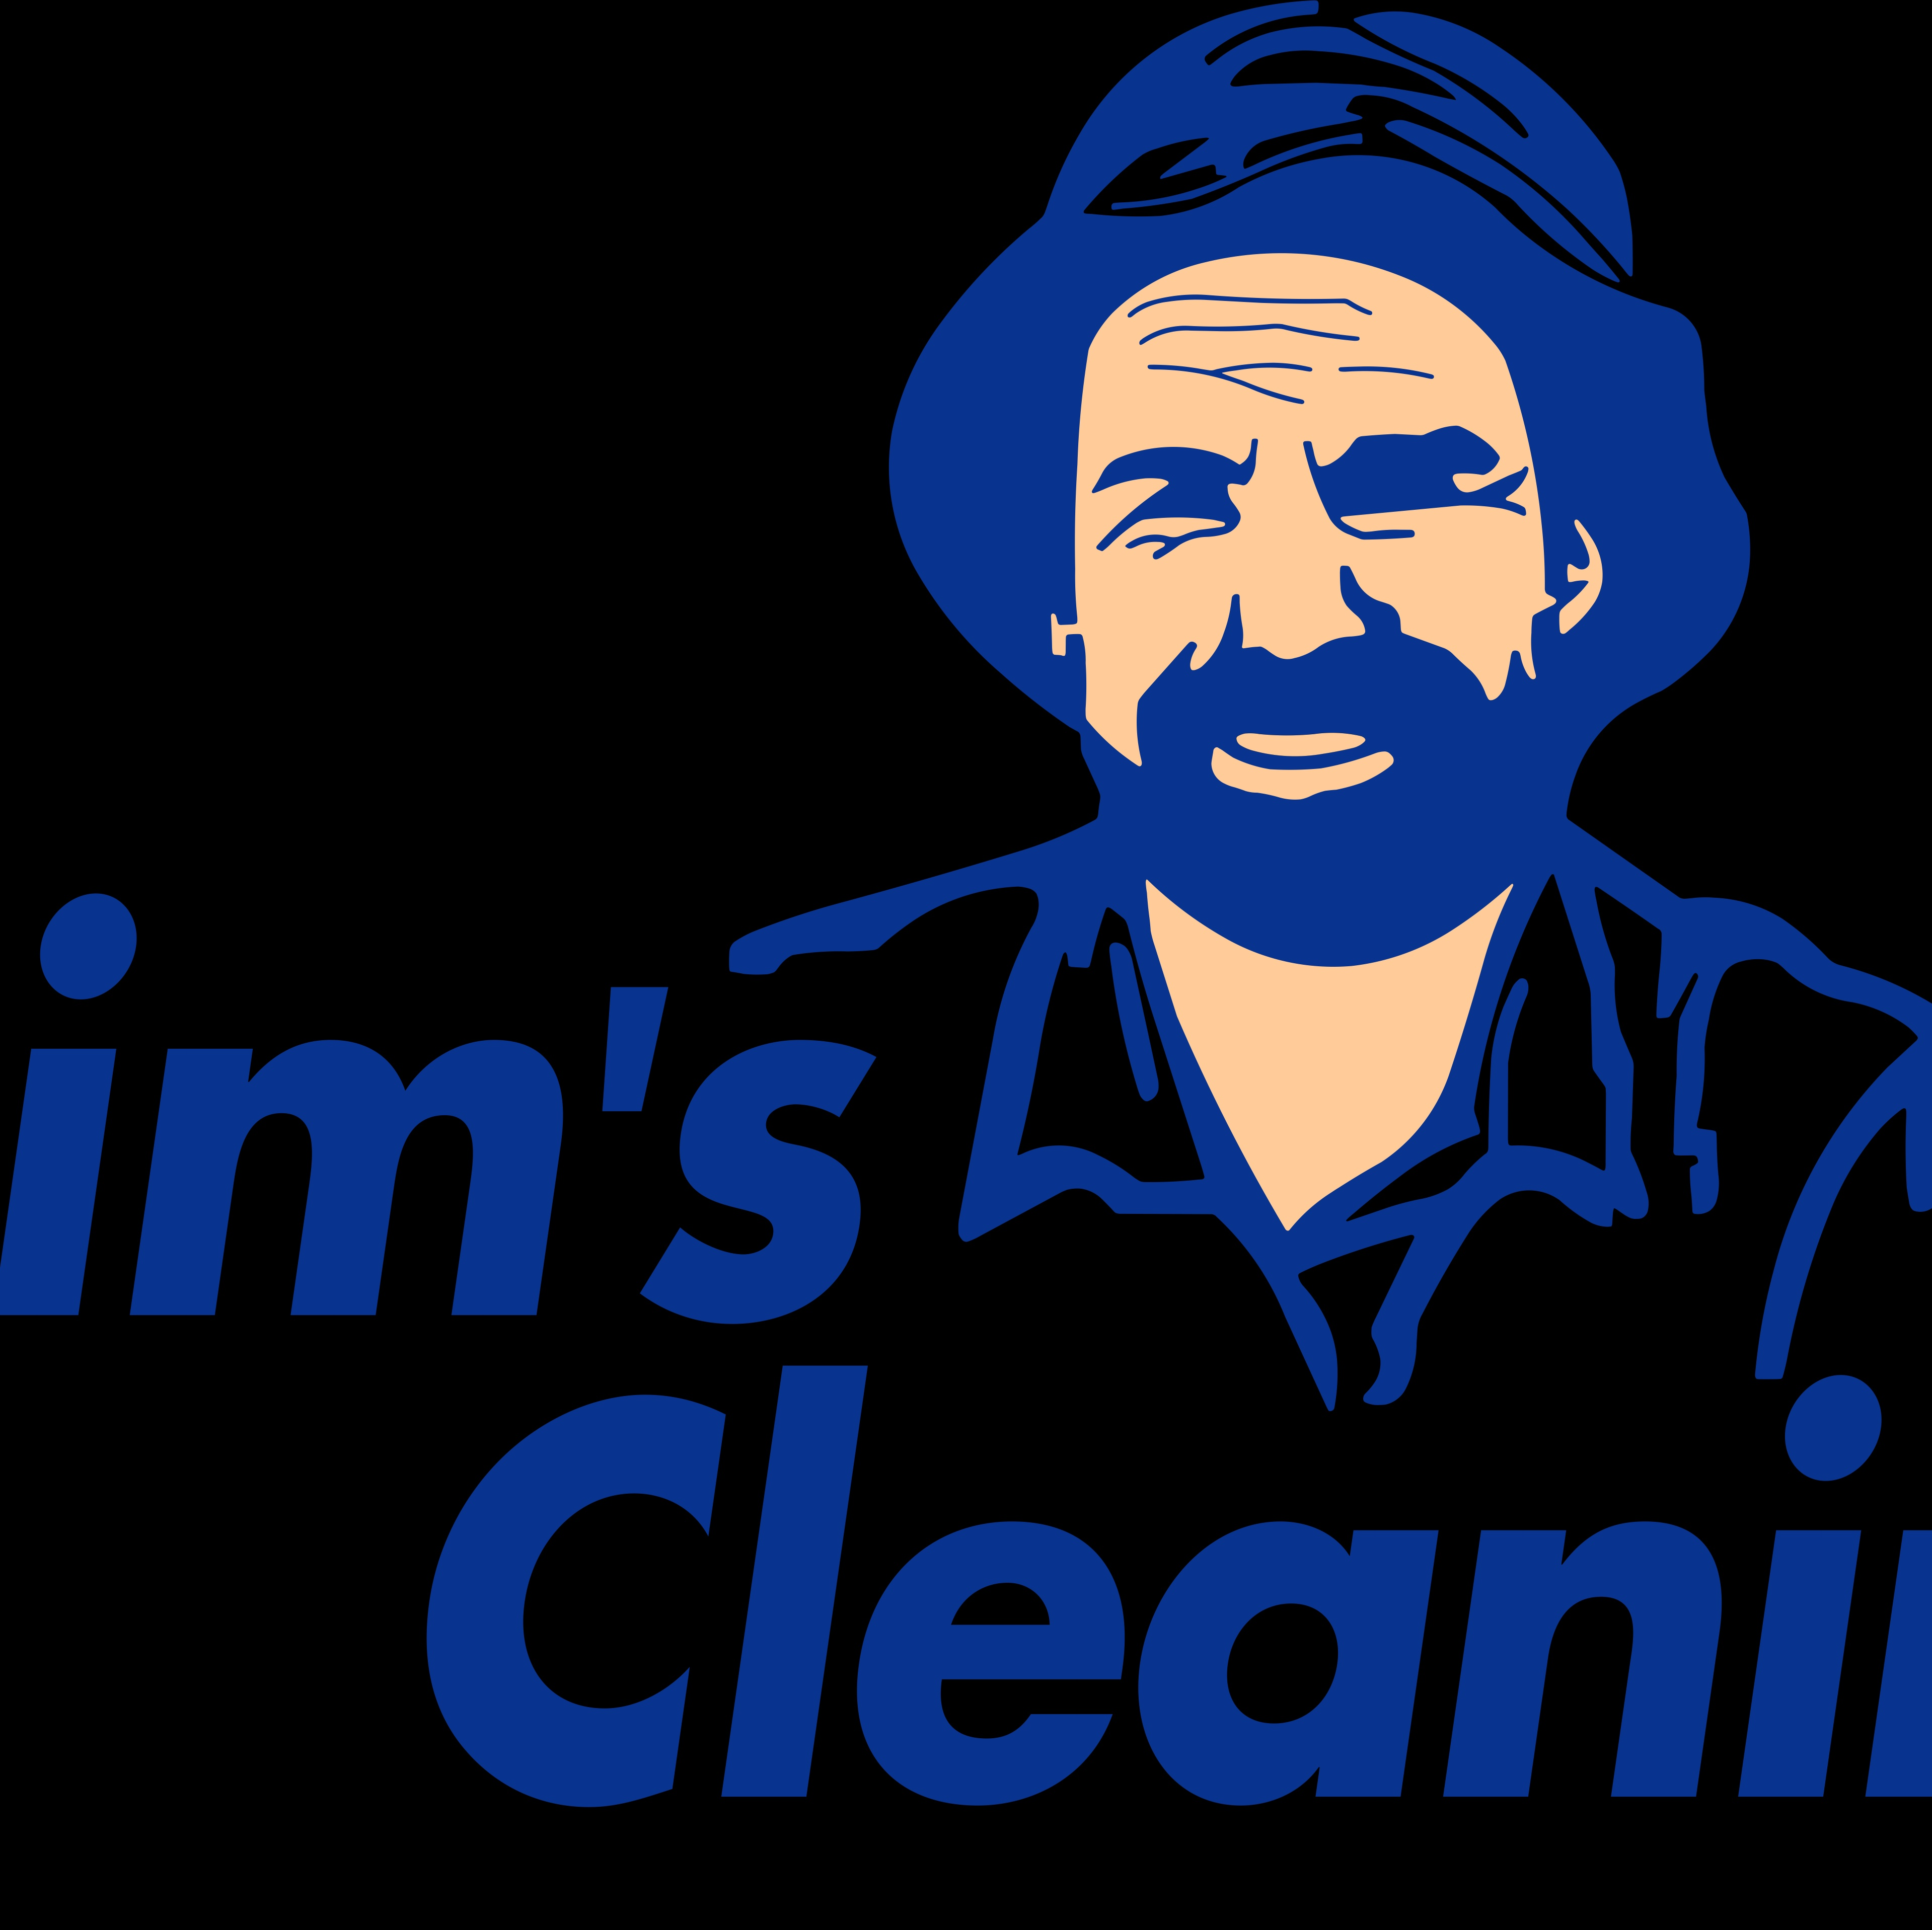 Jim's Cleaning Riccarton